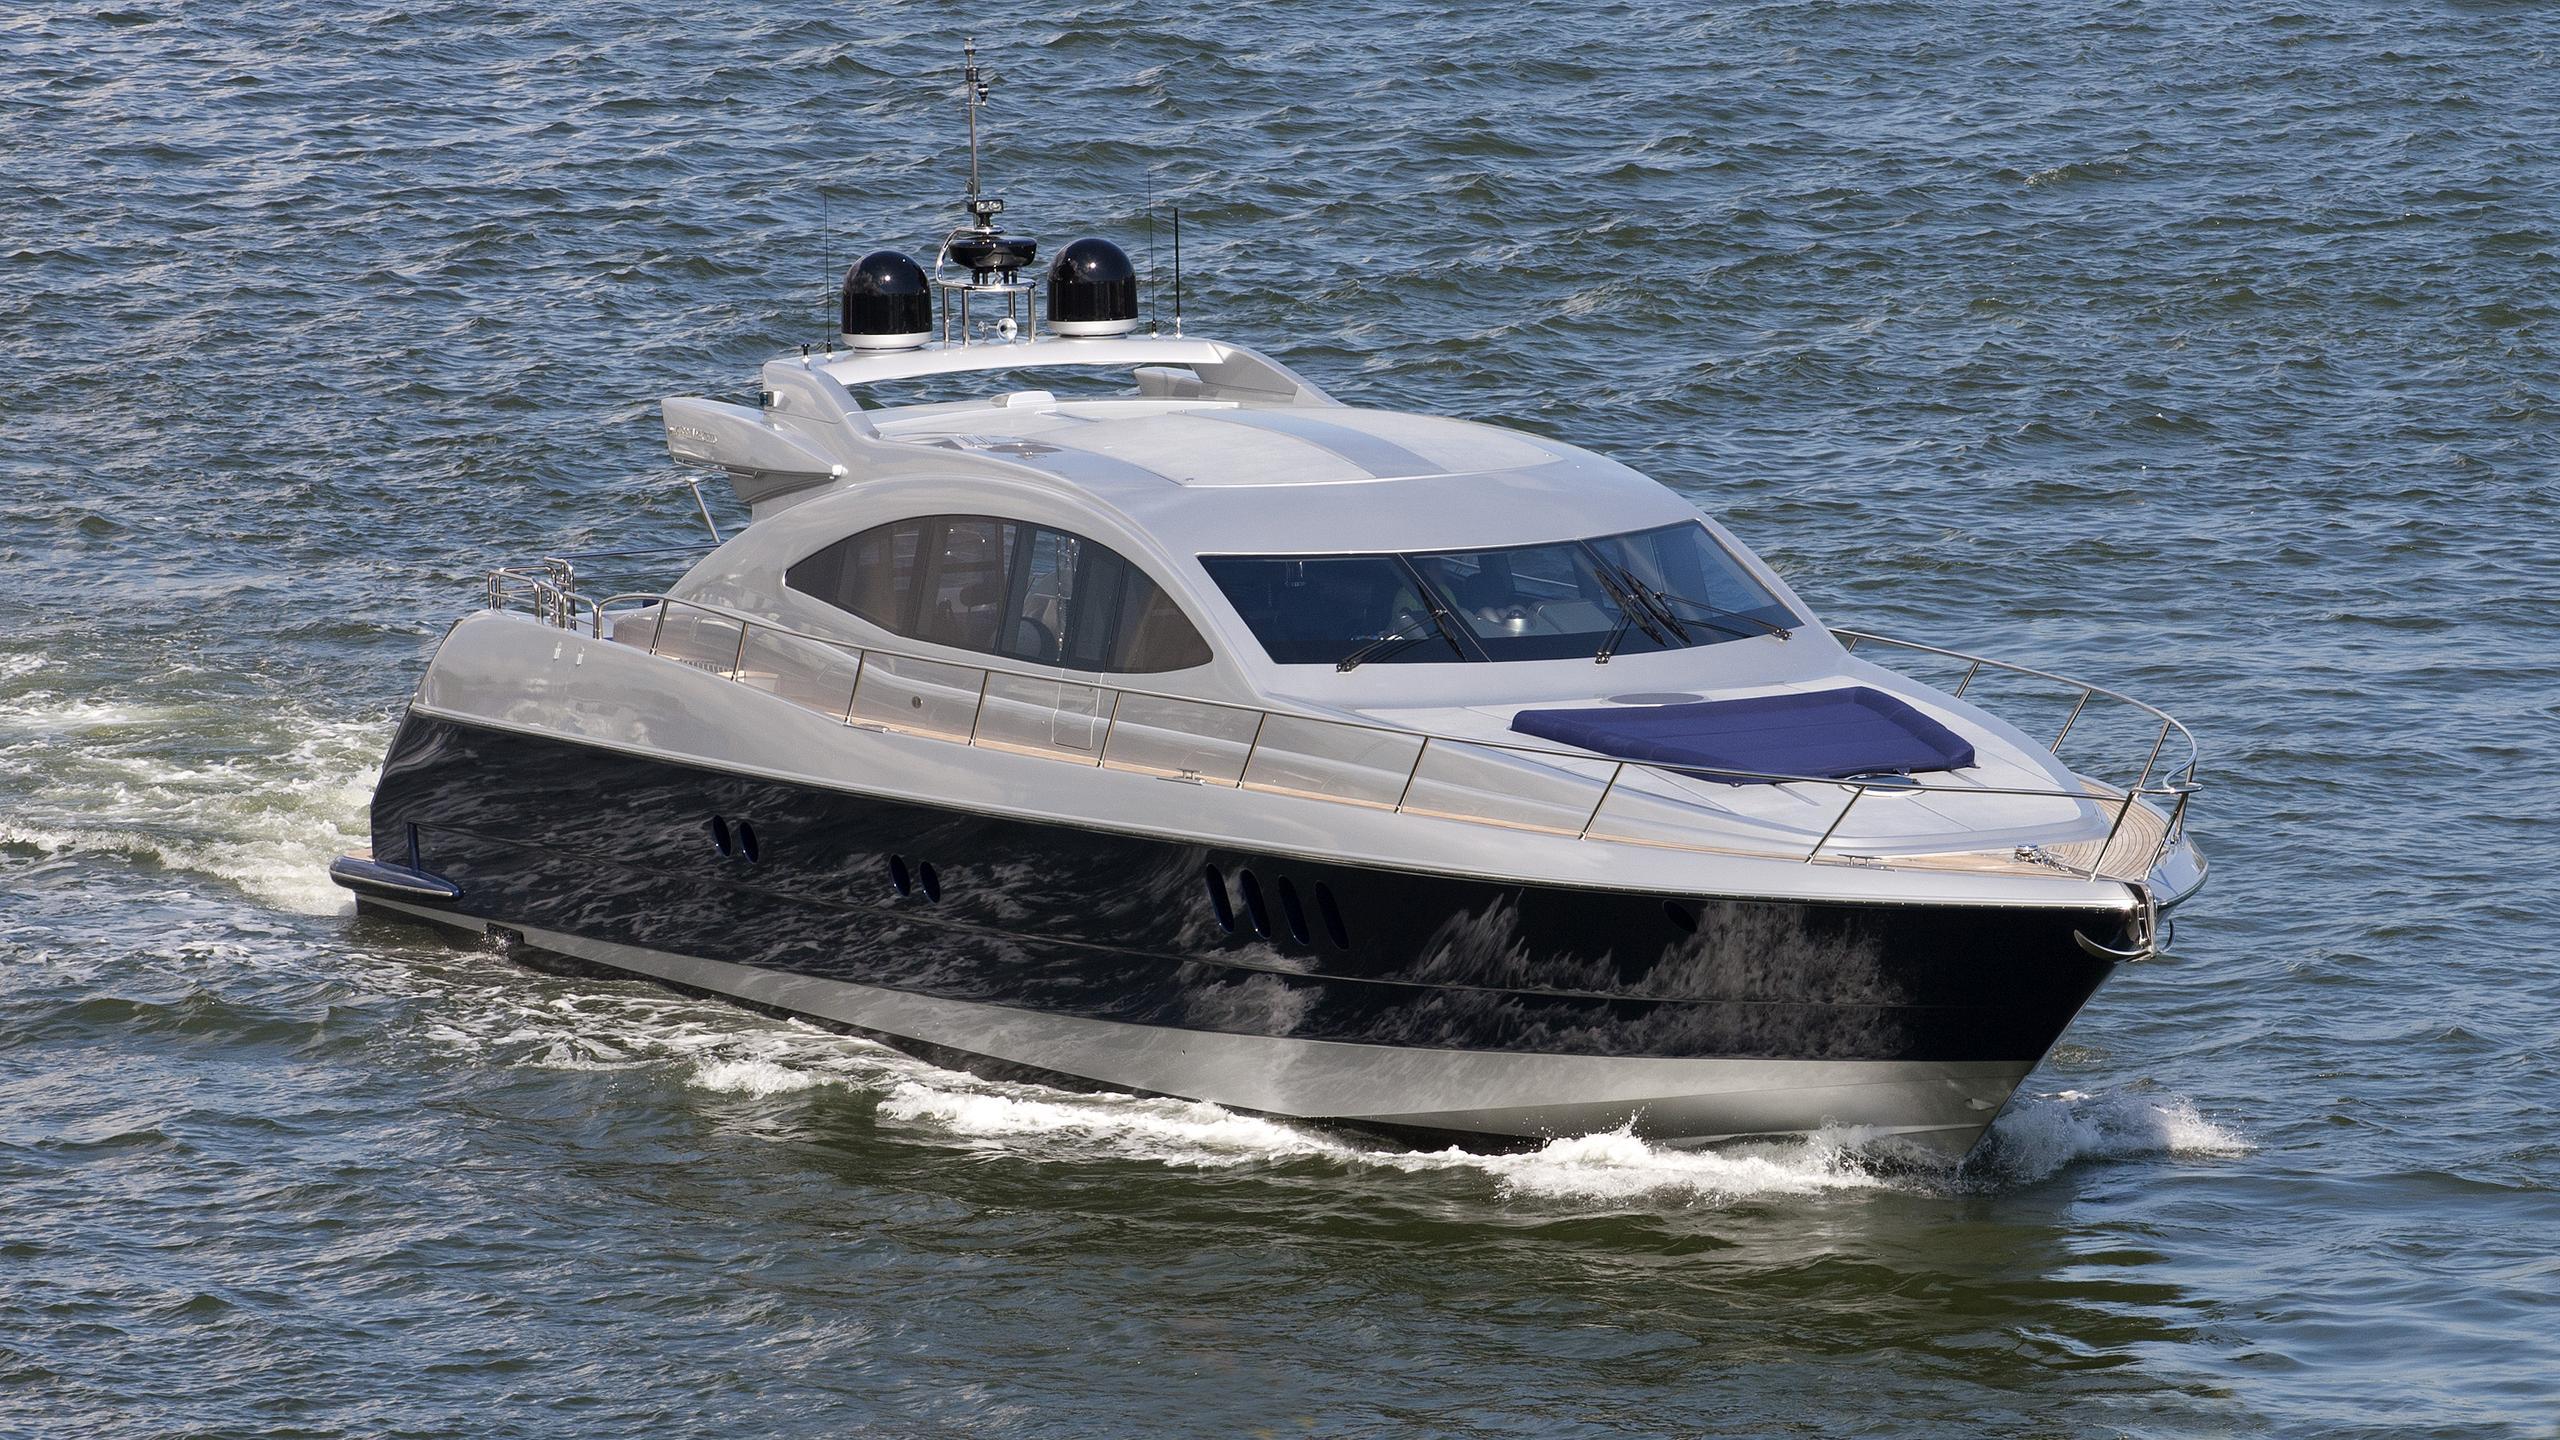 broadway-motor-yacht-warren-s87-sport-2007-26m-cruising